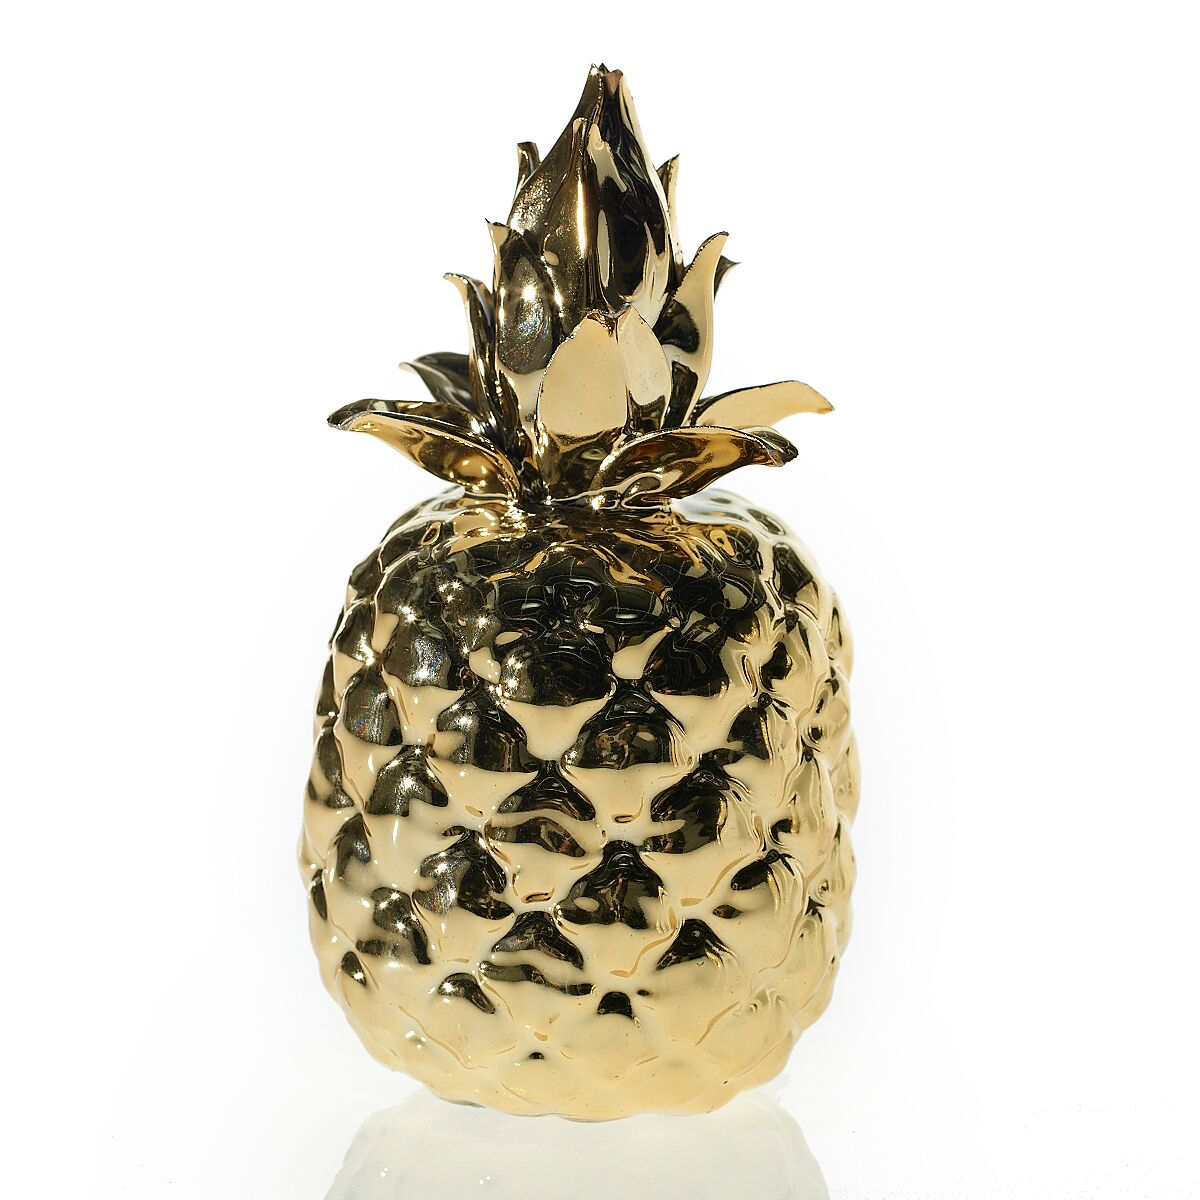 Metallic-Gold-Ceramic-Pineapple-Decoration-99740.jpg